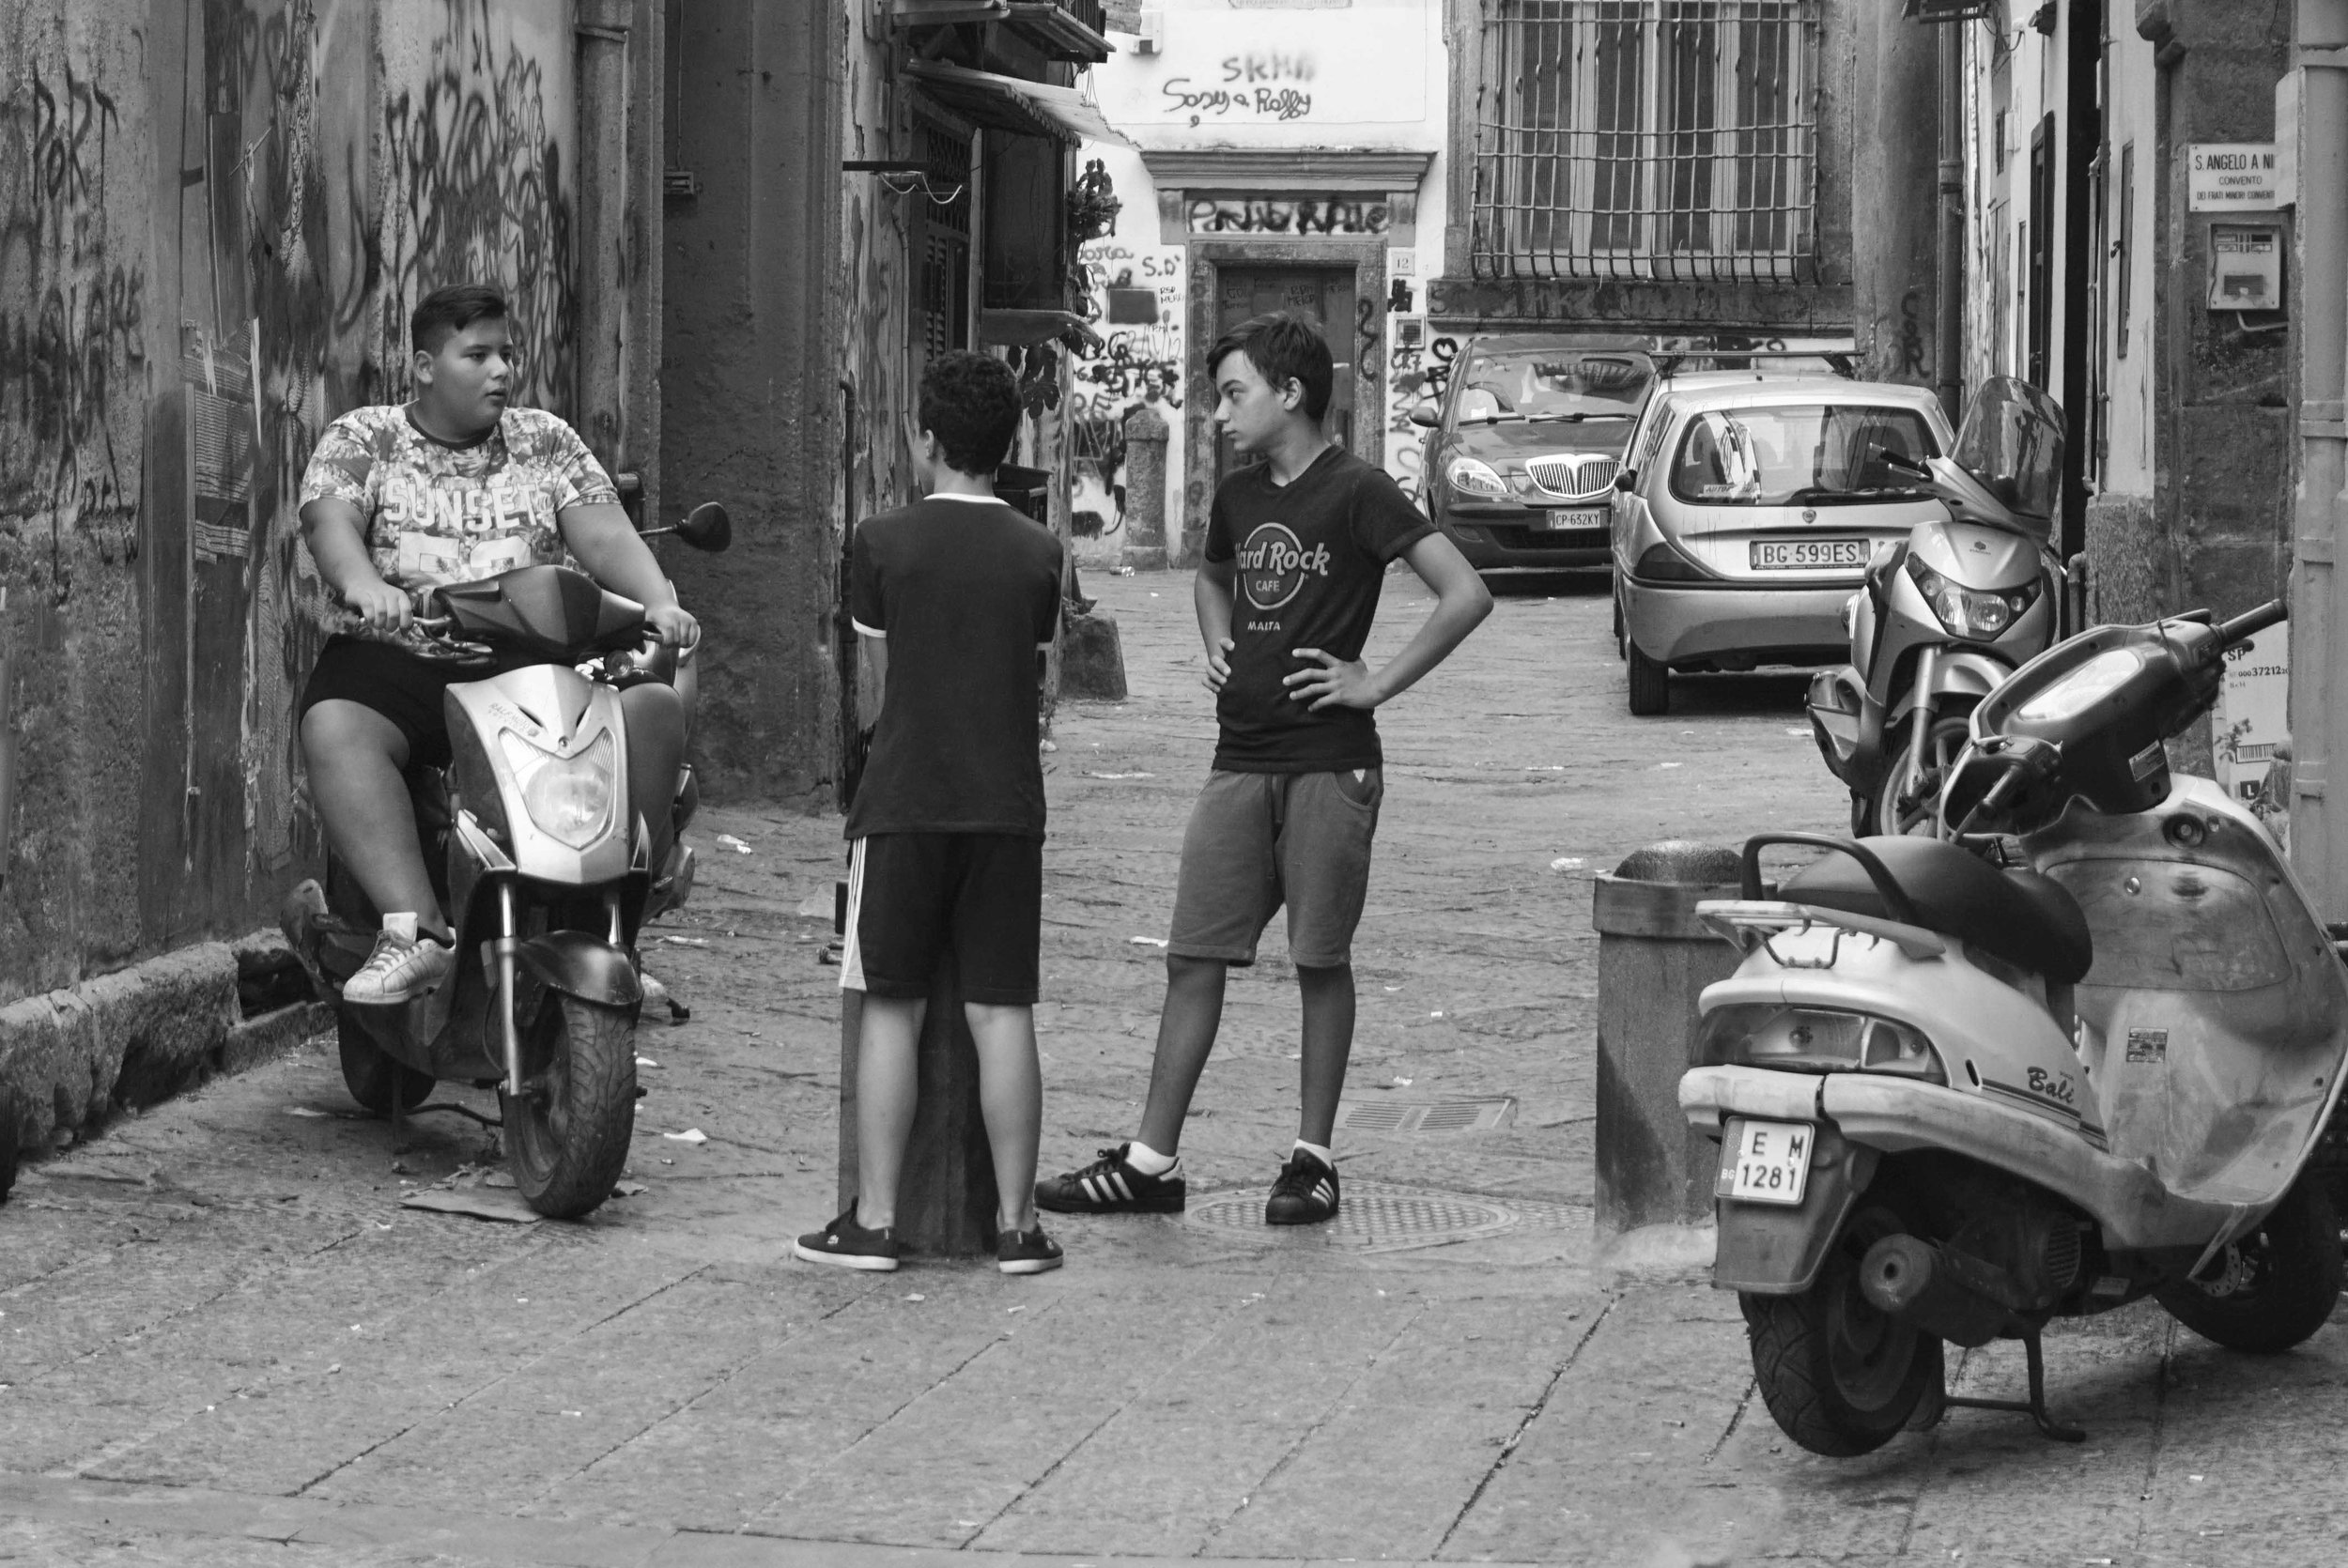 Naples' kids